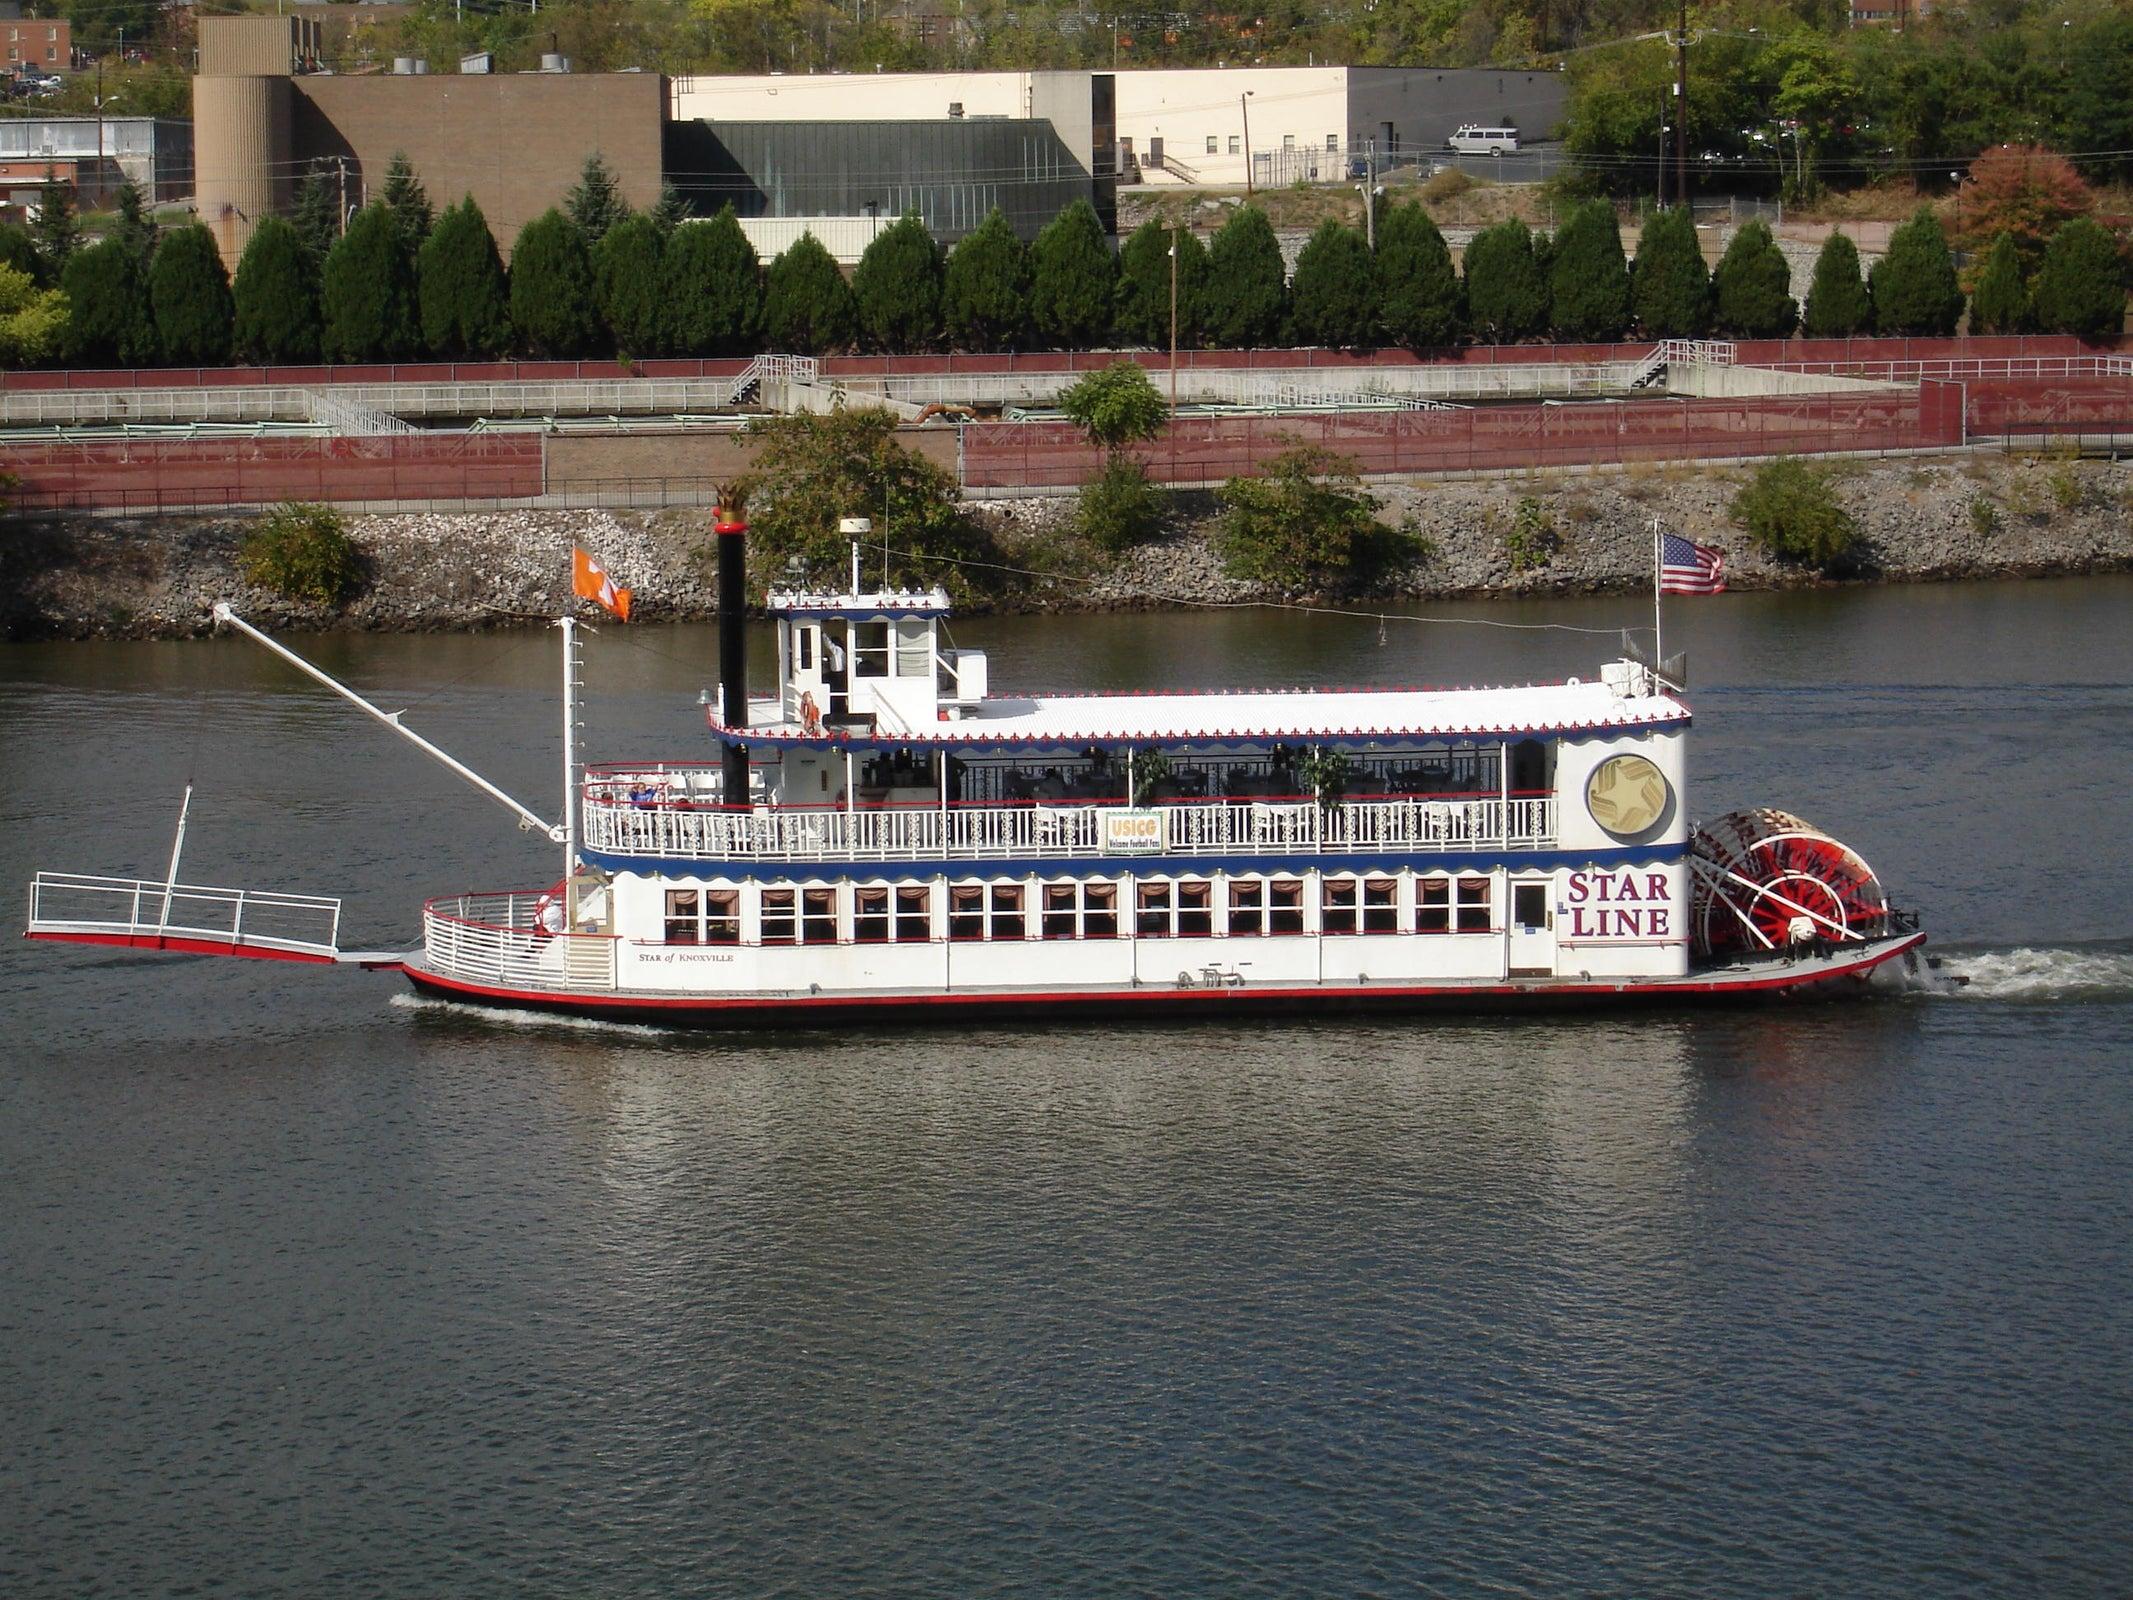 Star Line Boat